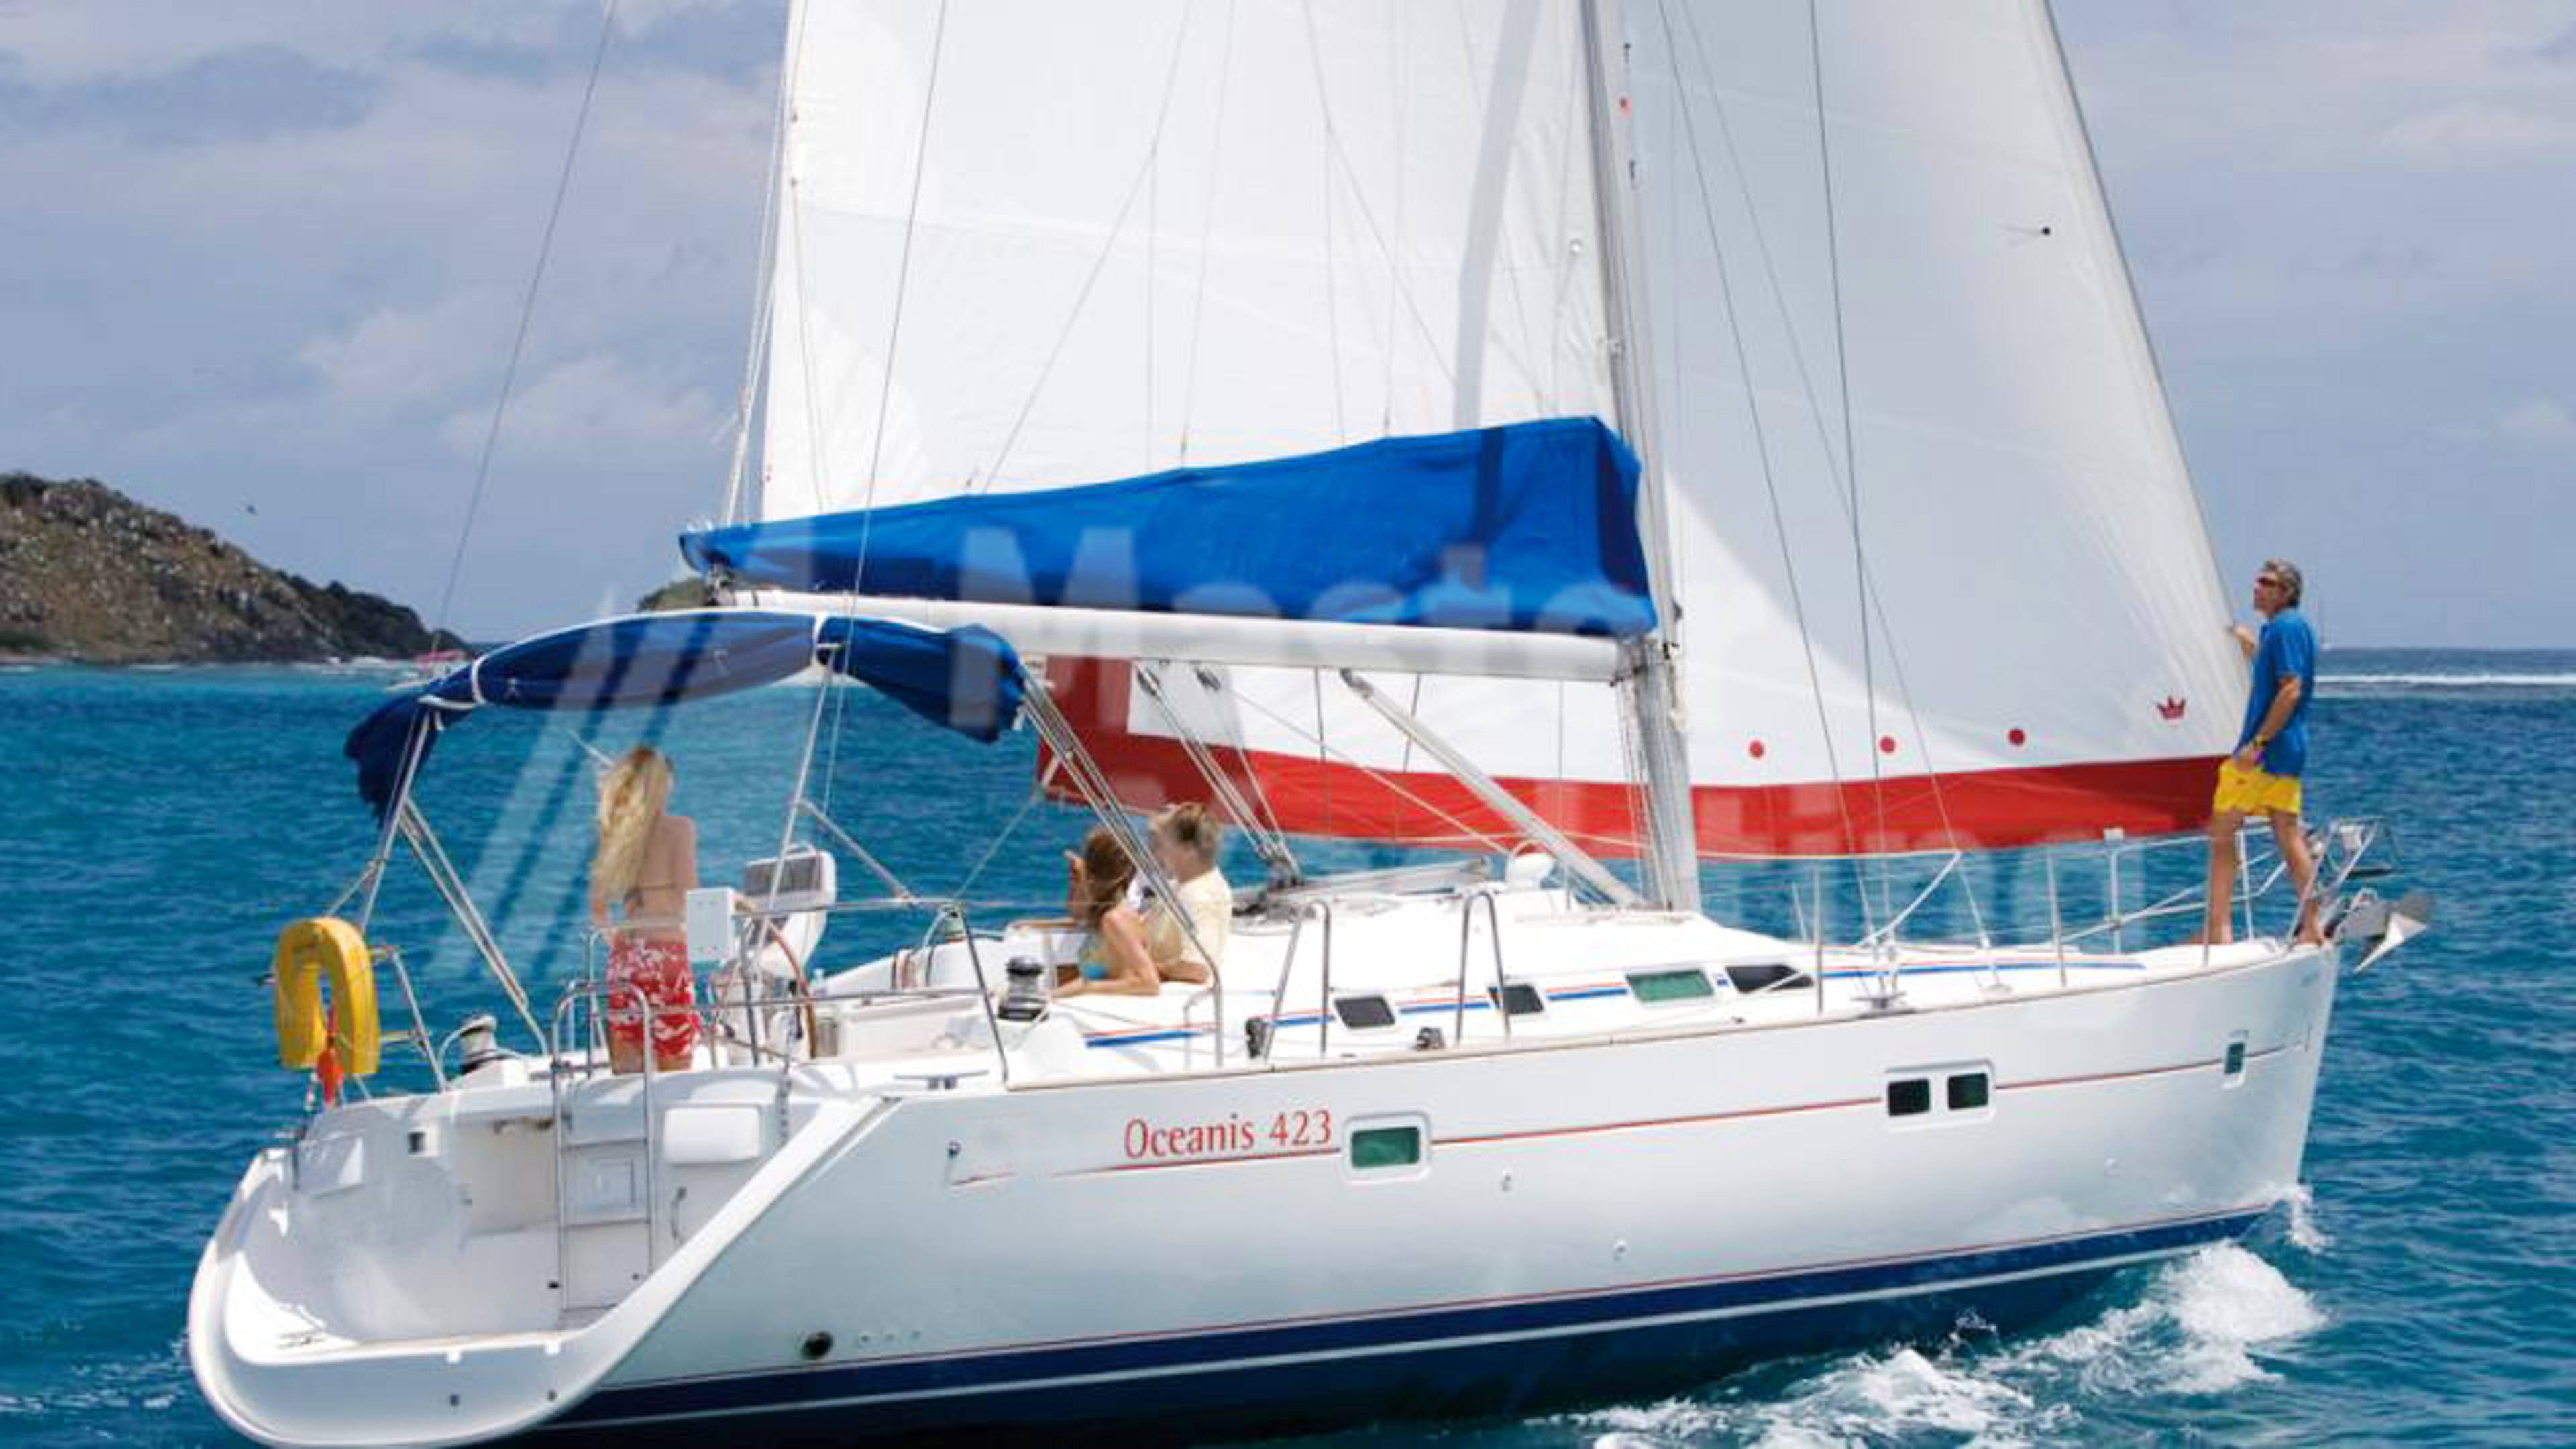 Sunsail Oceanis 423